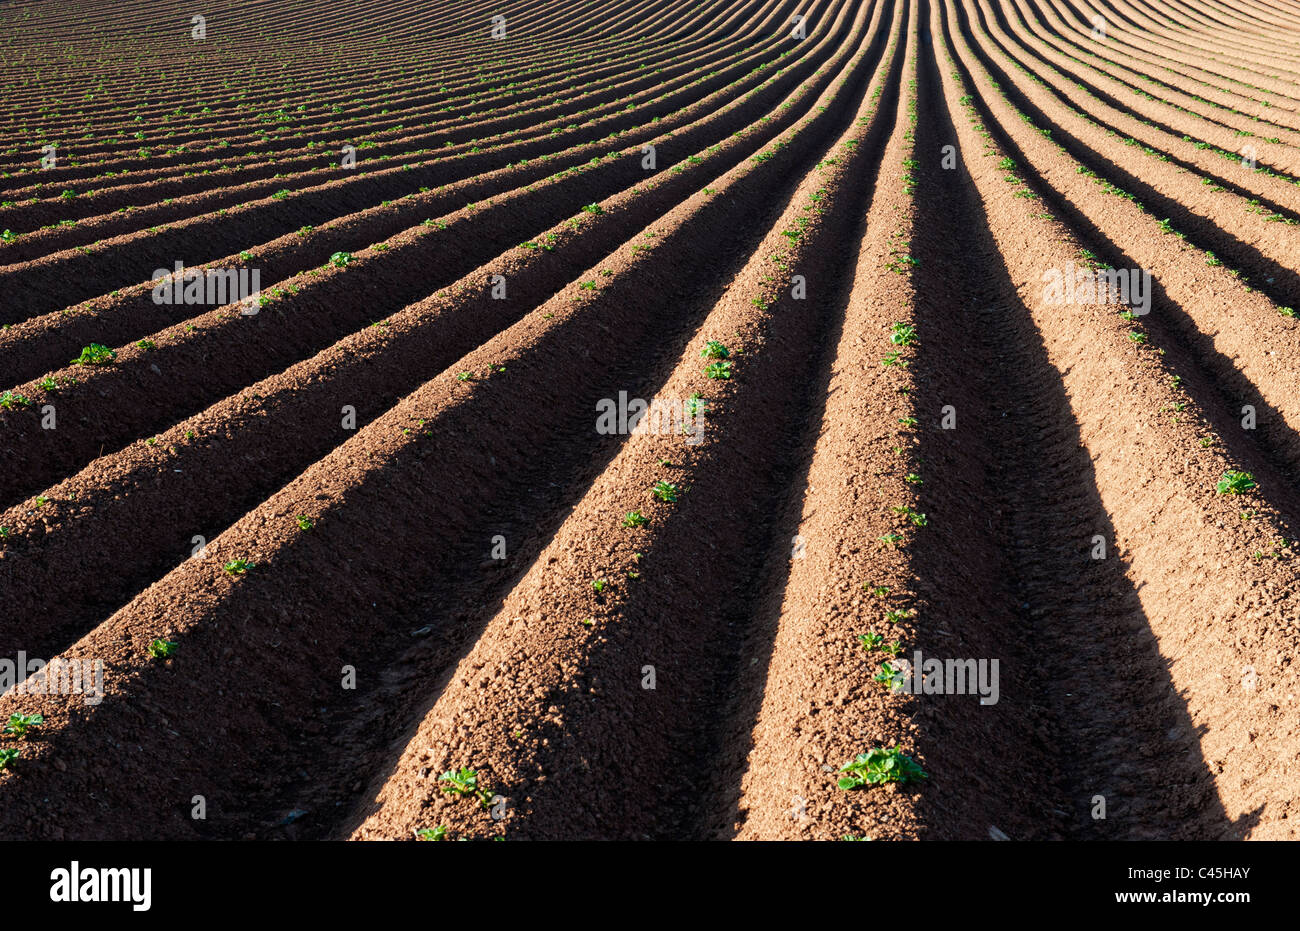 Ridge and furrow ploughed field pattern. UK - Stock Image